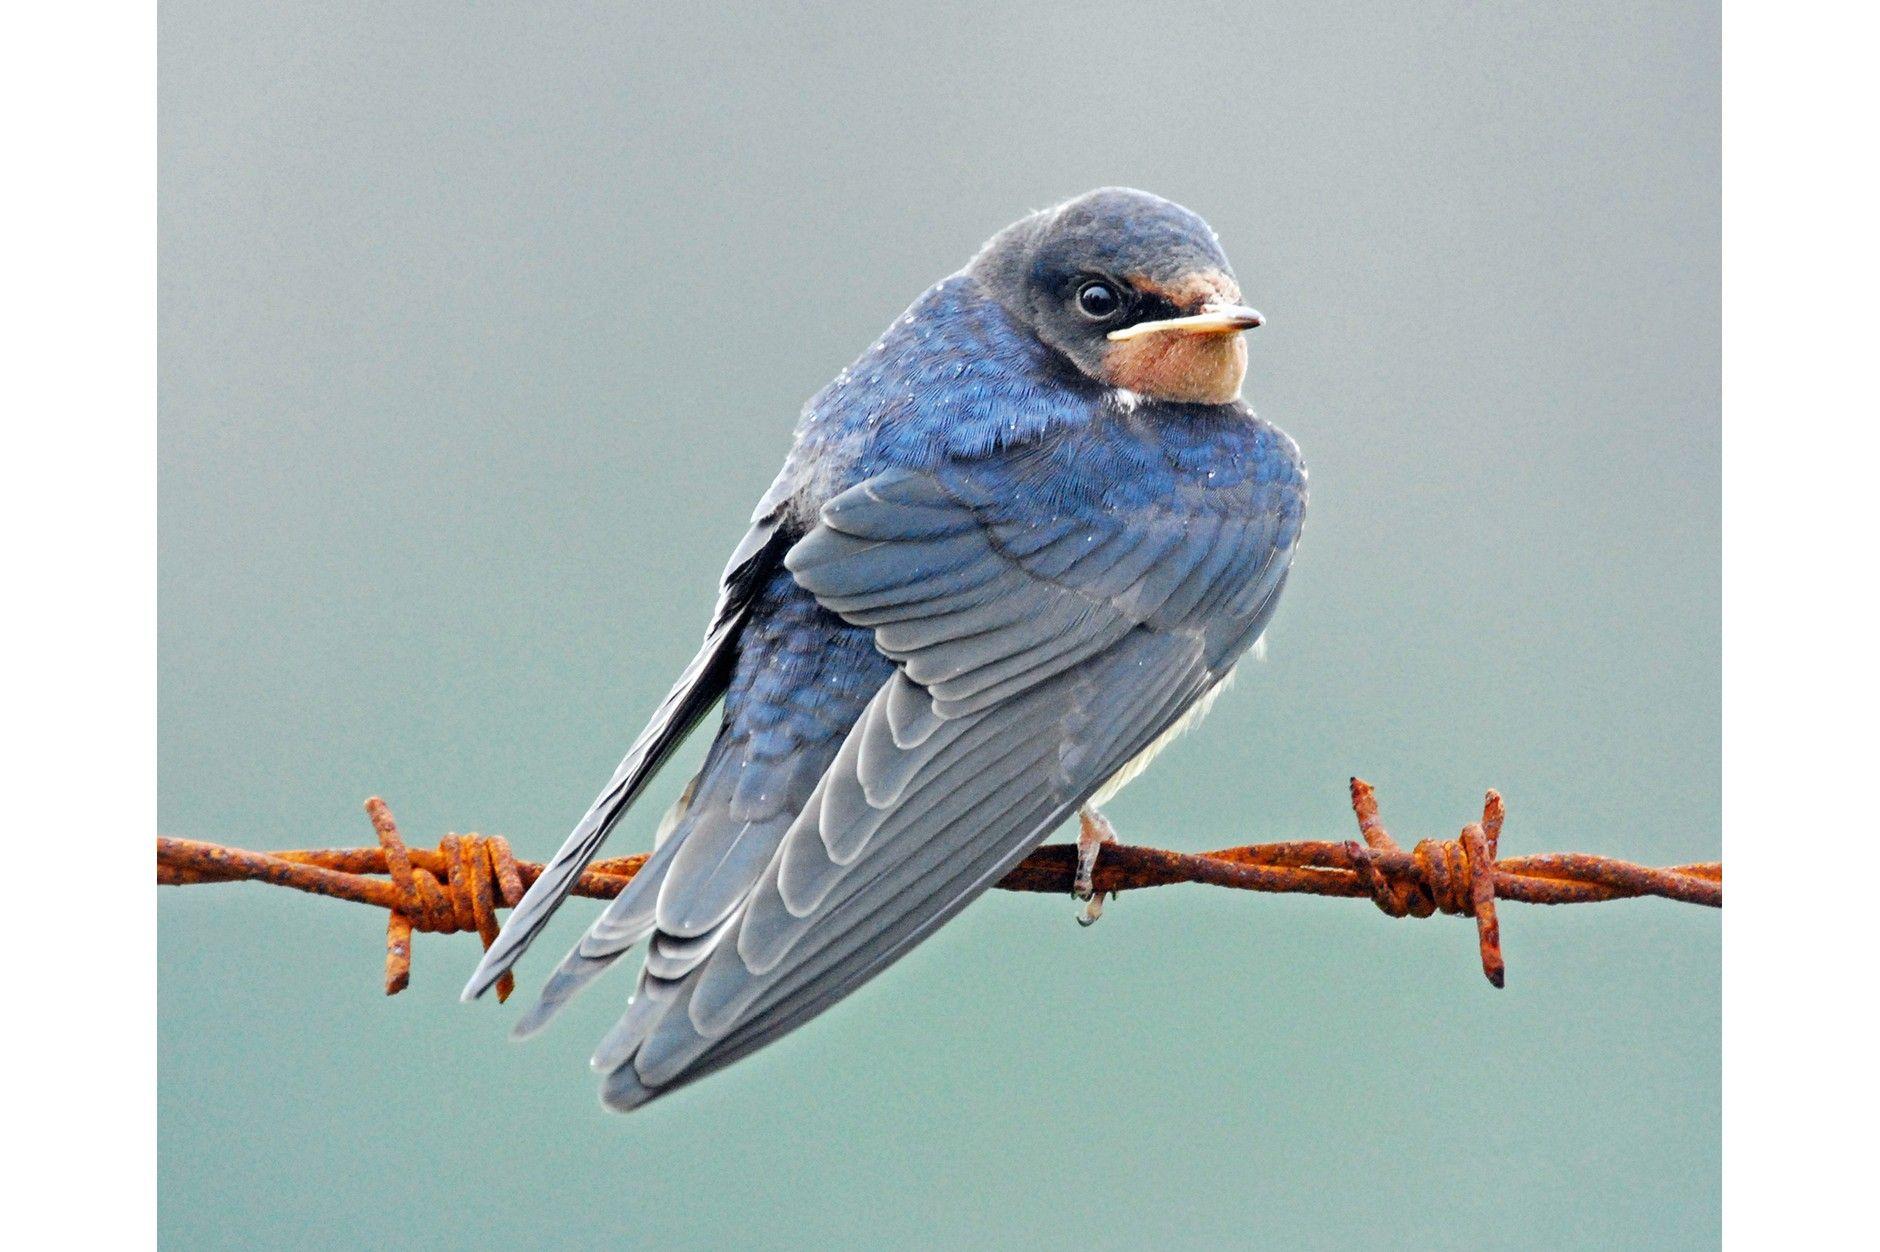 Barn Swallow | Barn swallow, Animal facts, Swallows return